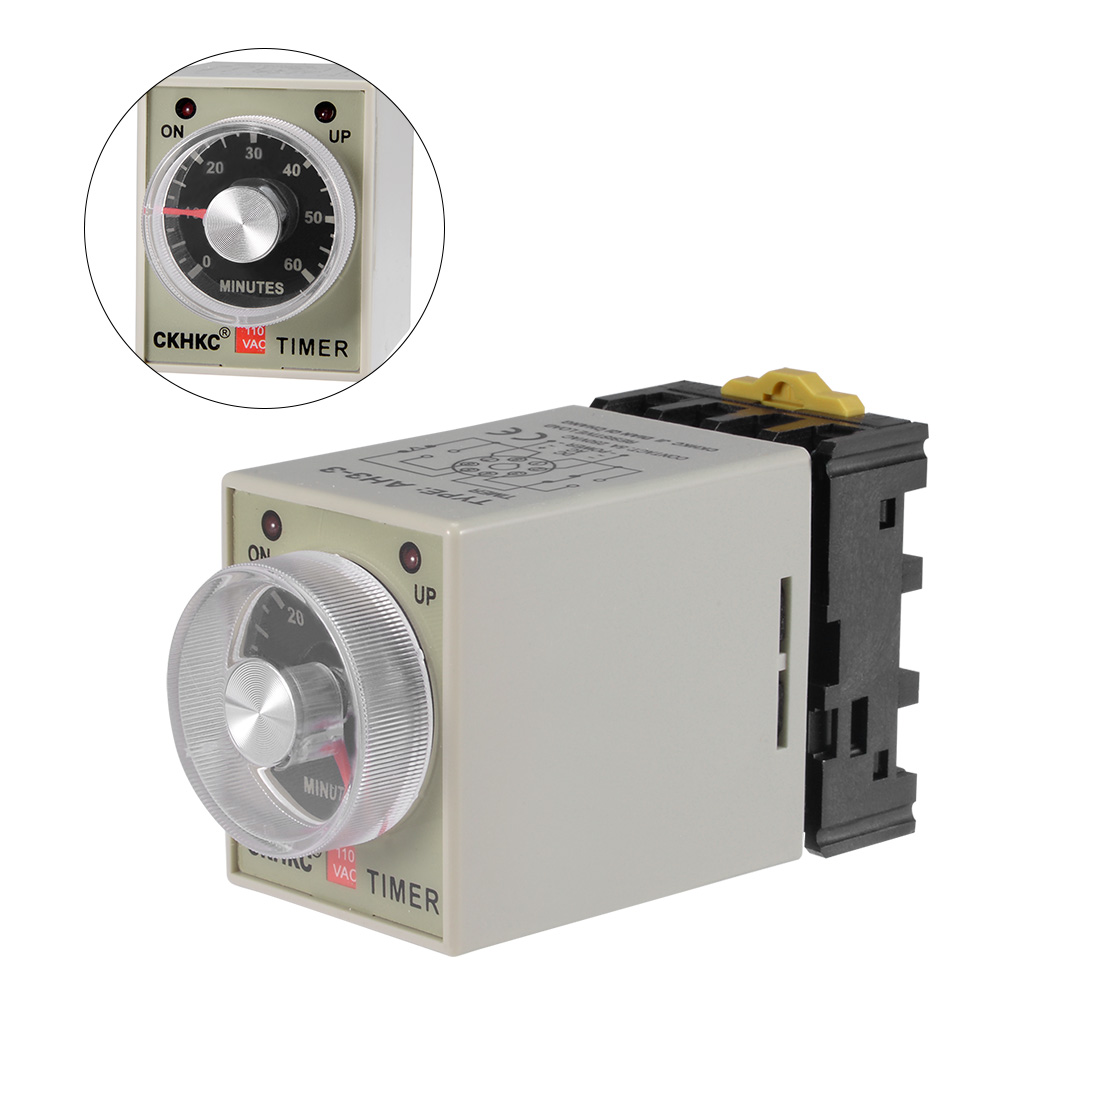 AC110V 60M 8 Terminals Range Adjustable Delay Timer Time Relay AH3-3